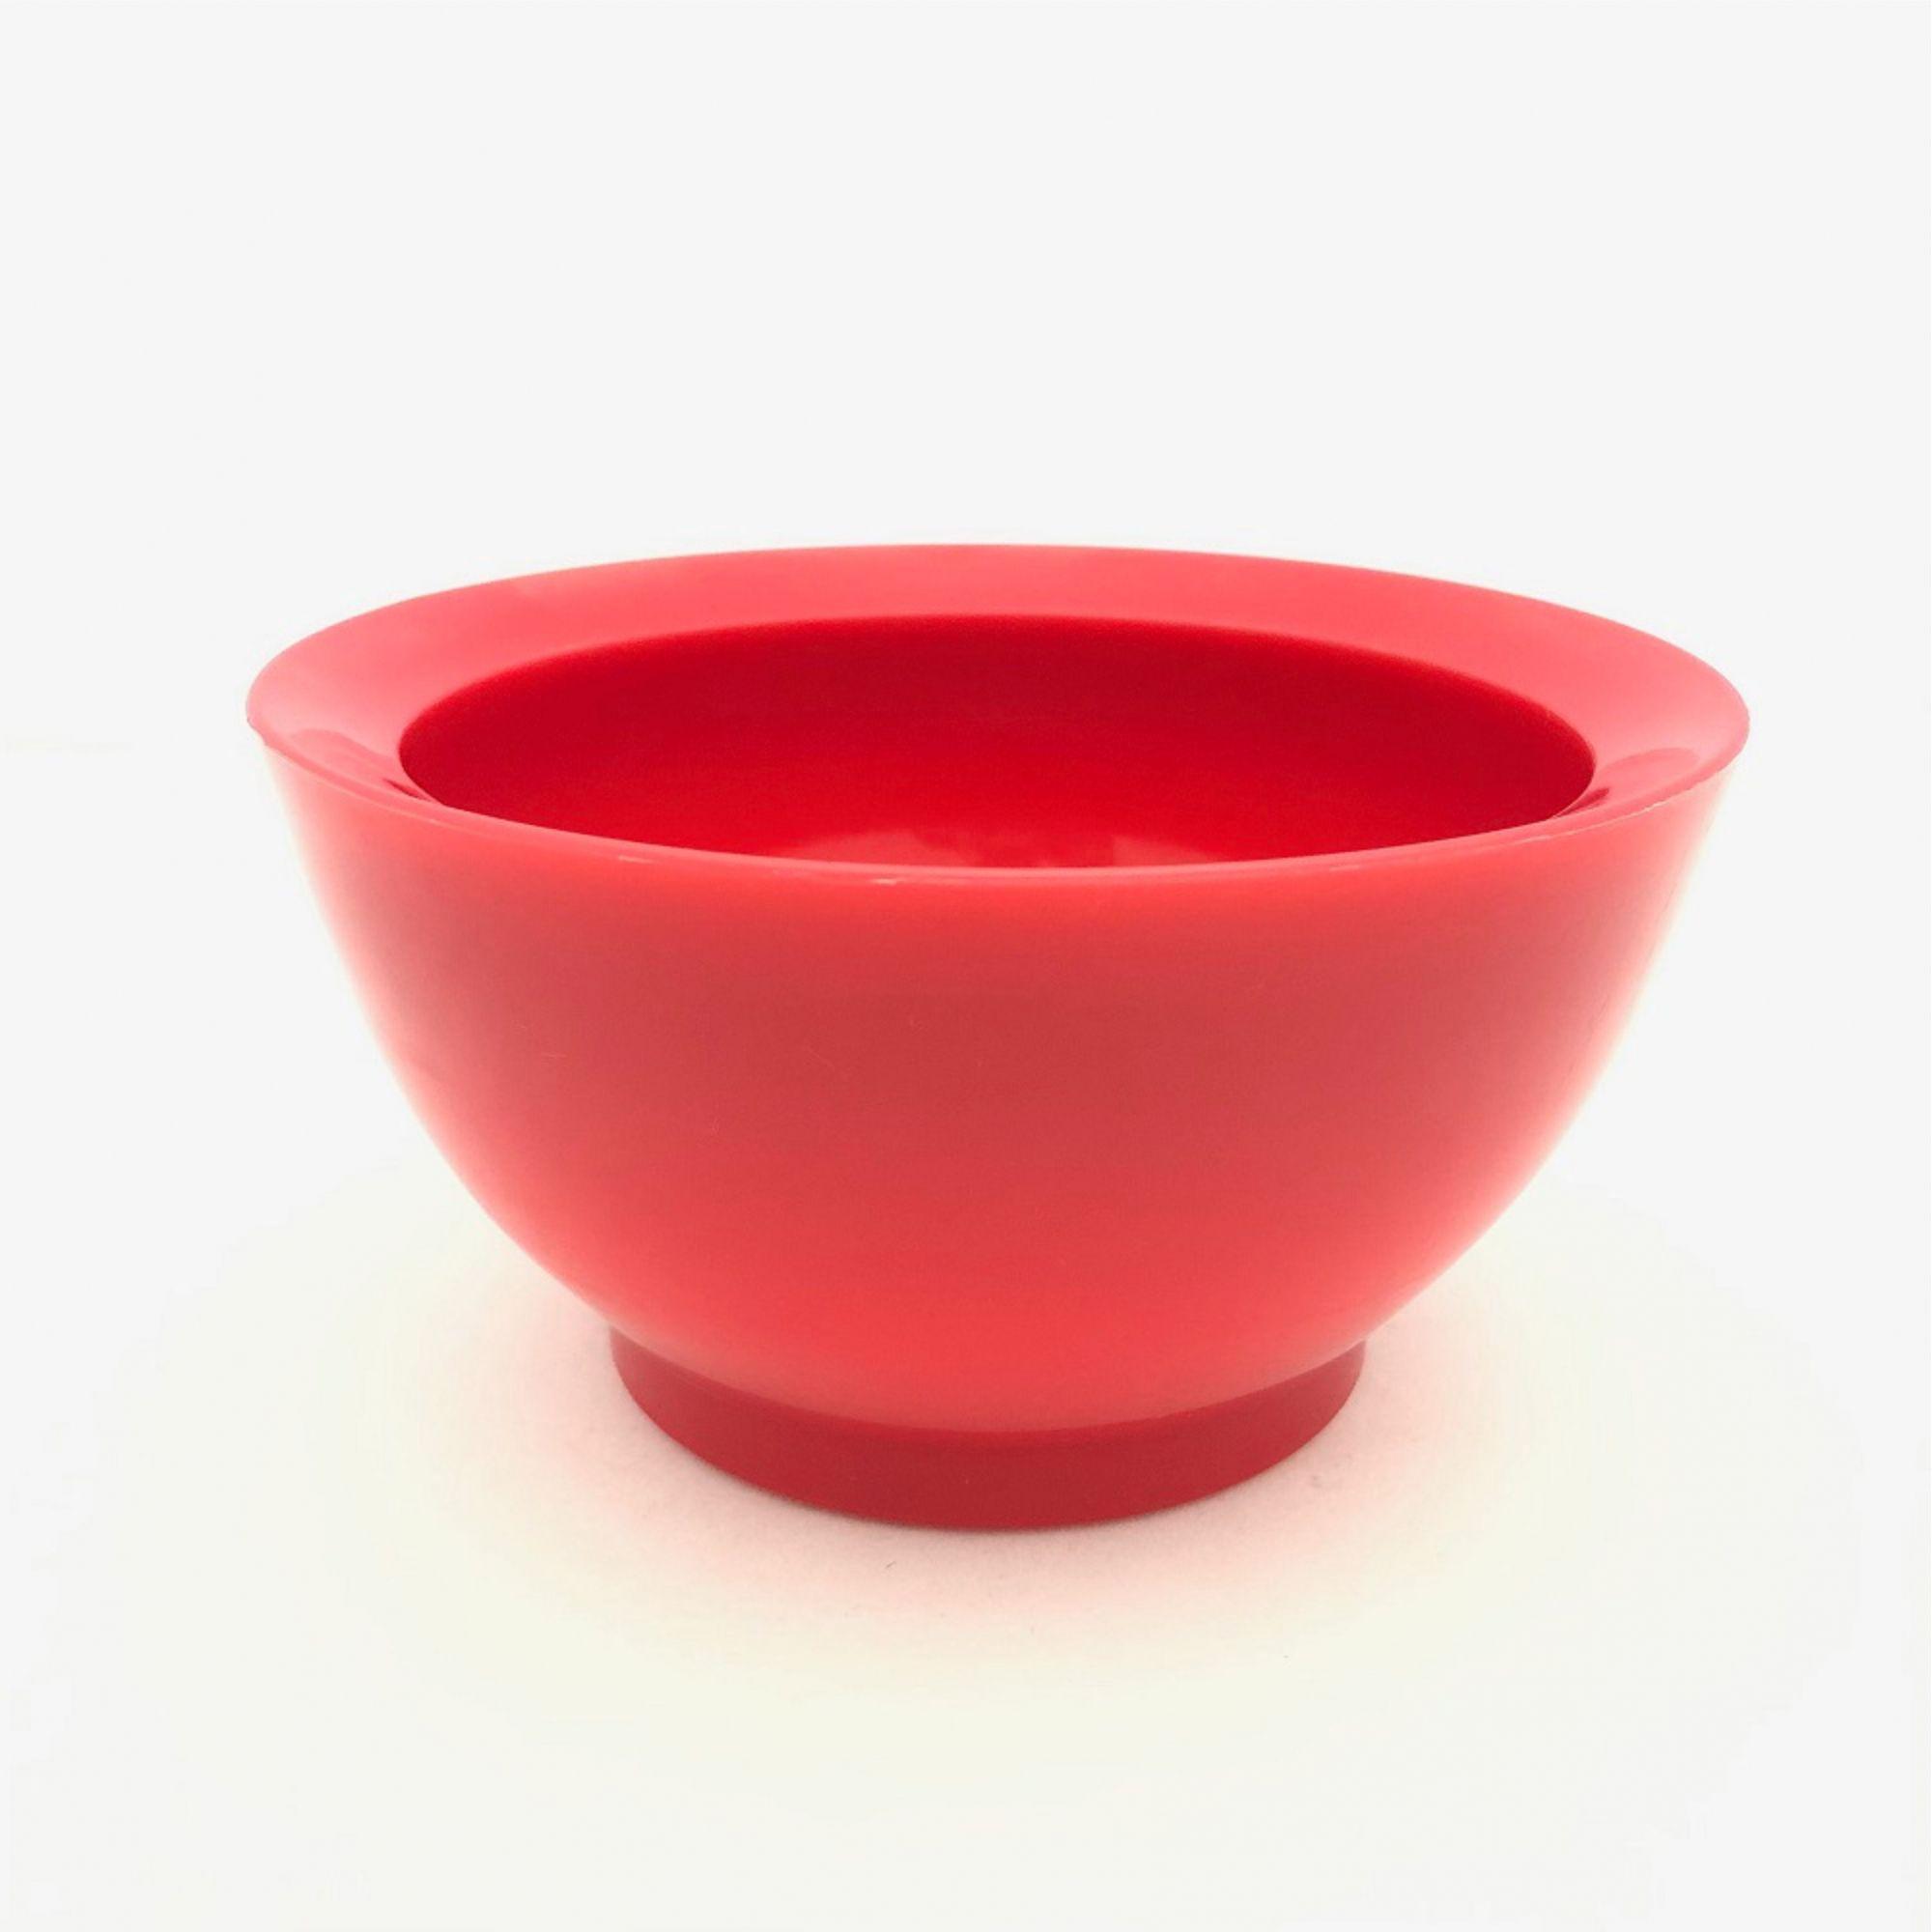 Bowl Calibowl Del Mar Vermelho